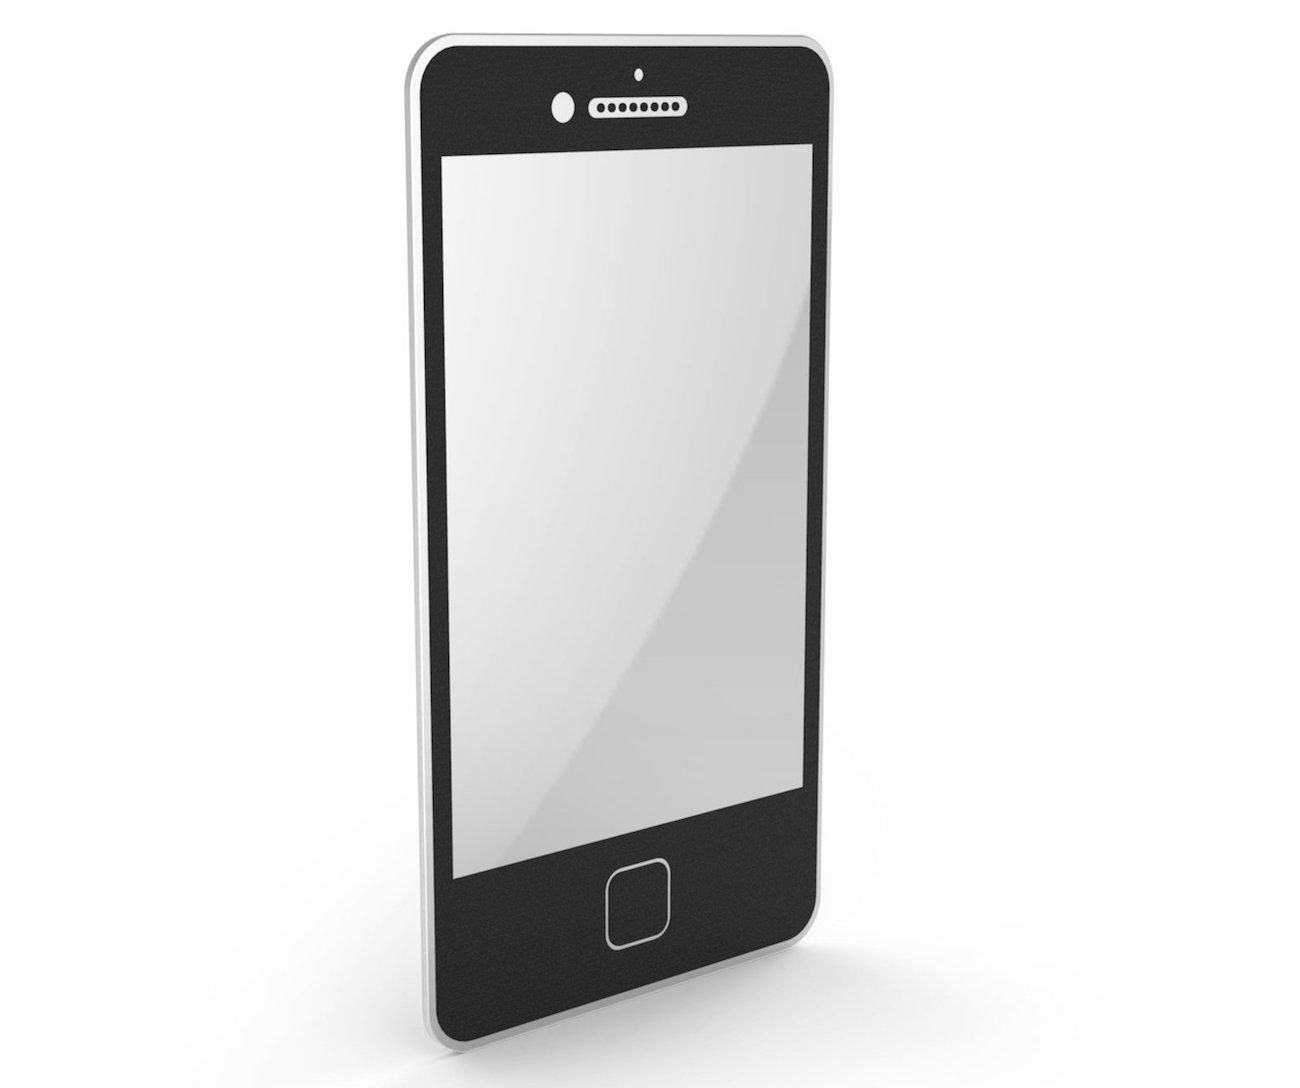 Selfie Pocket Mirror – Resembling a Smartphone